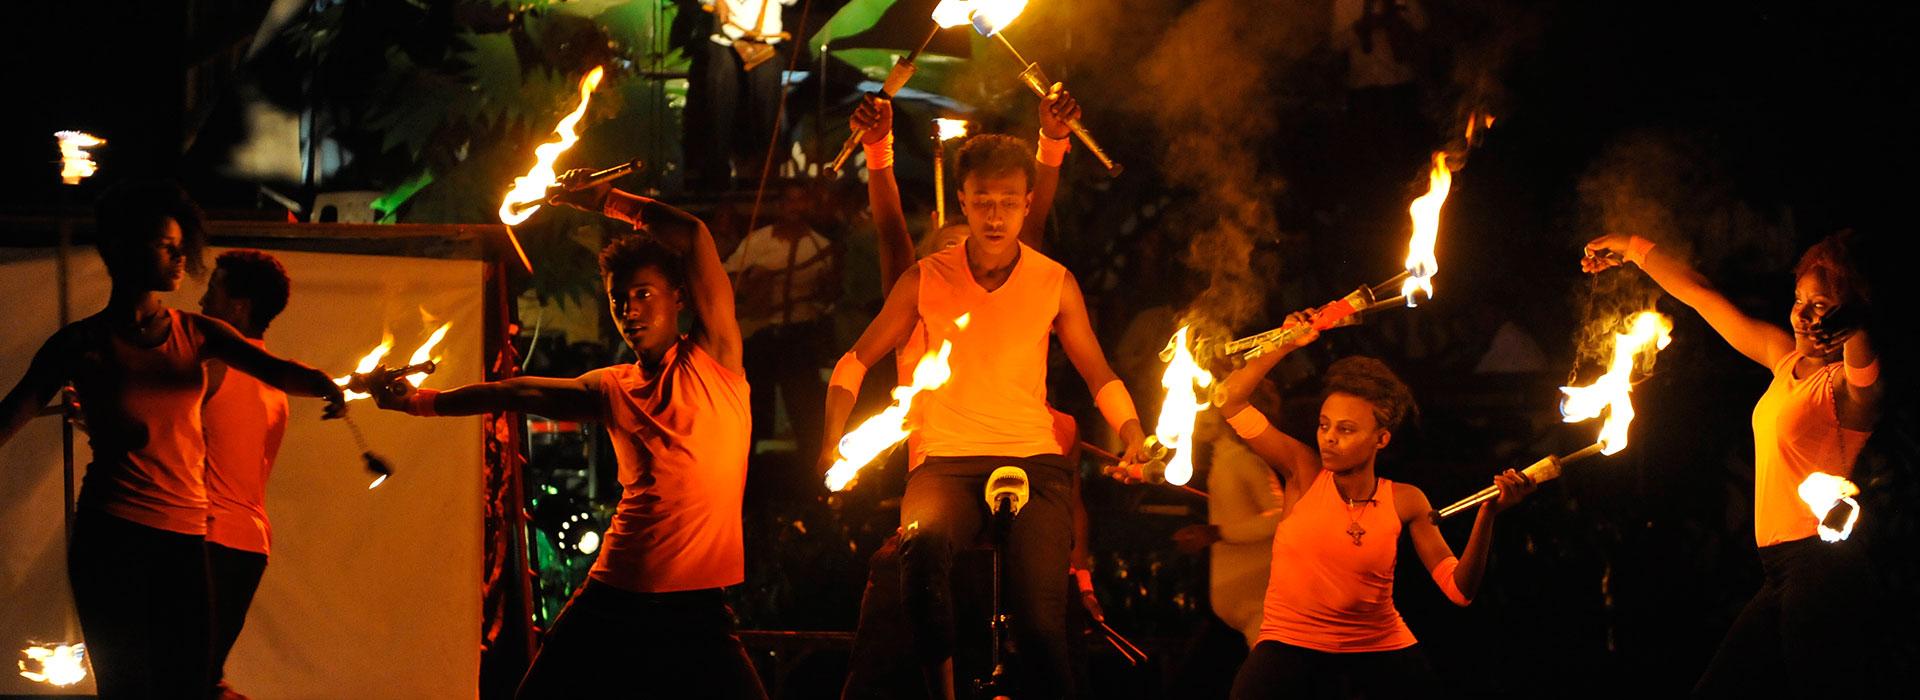 Premier Festival de Cirque Social Africain - Ethiopia